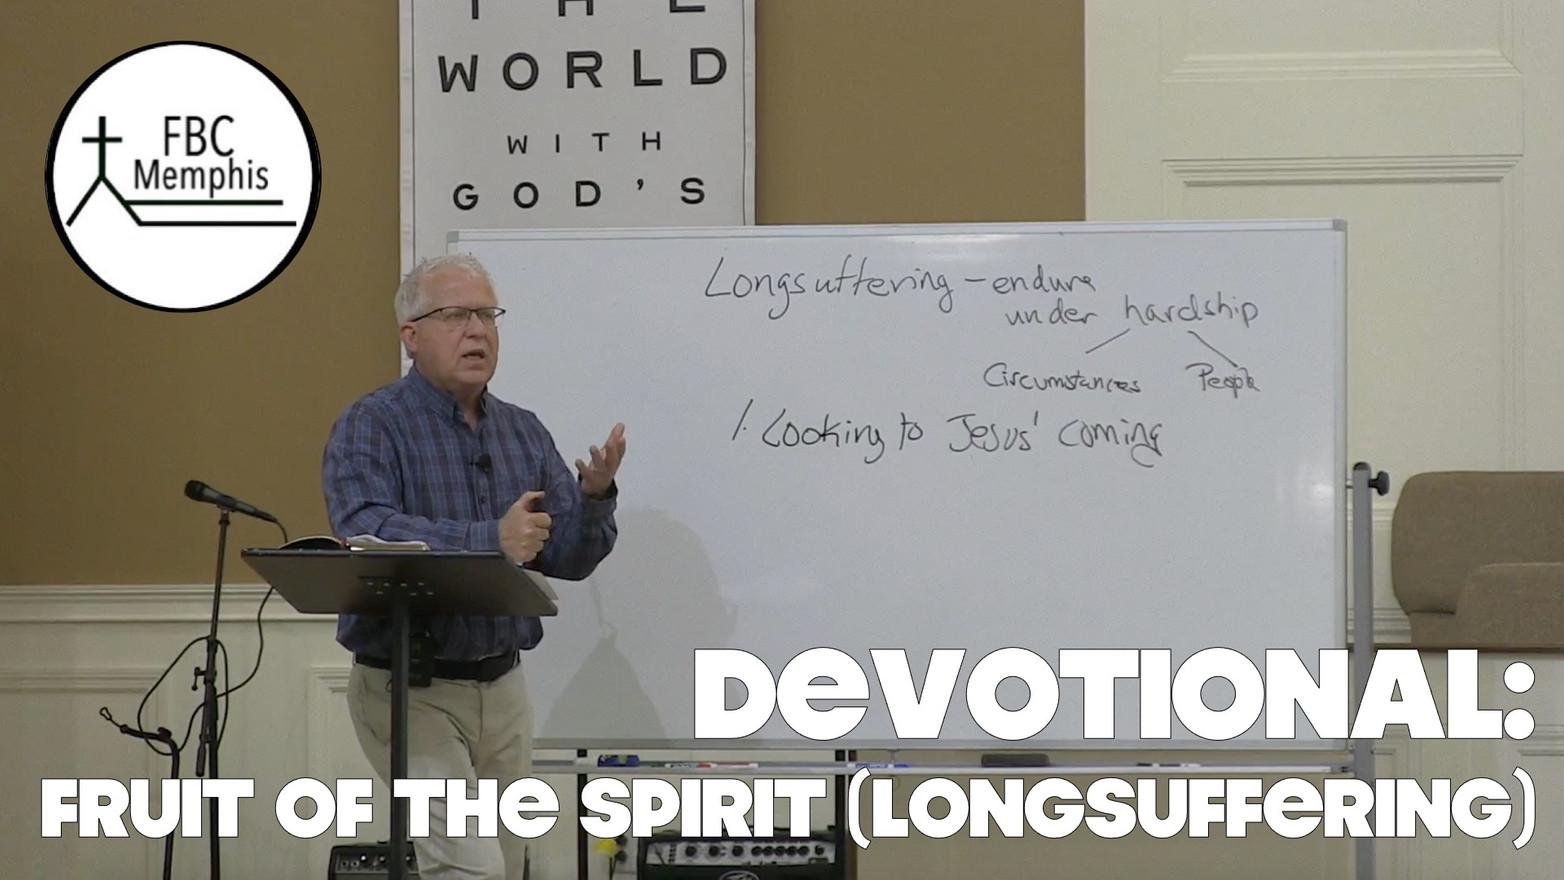 Wednesday Devotional: Fruit Of The Spirit (Longsuffering)